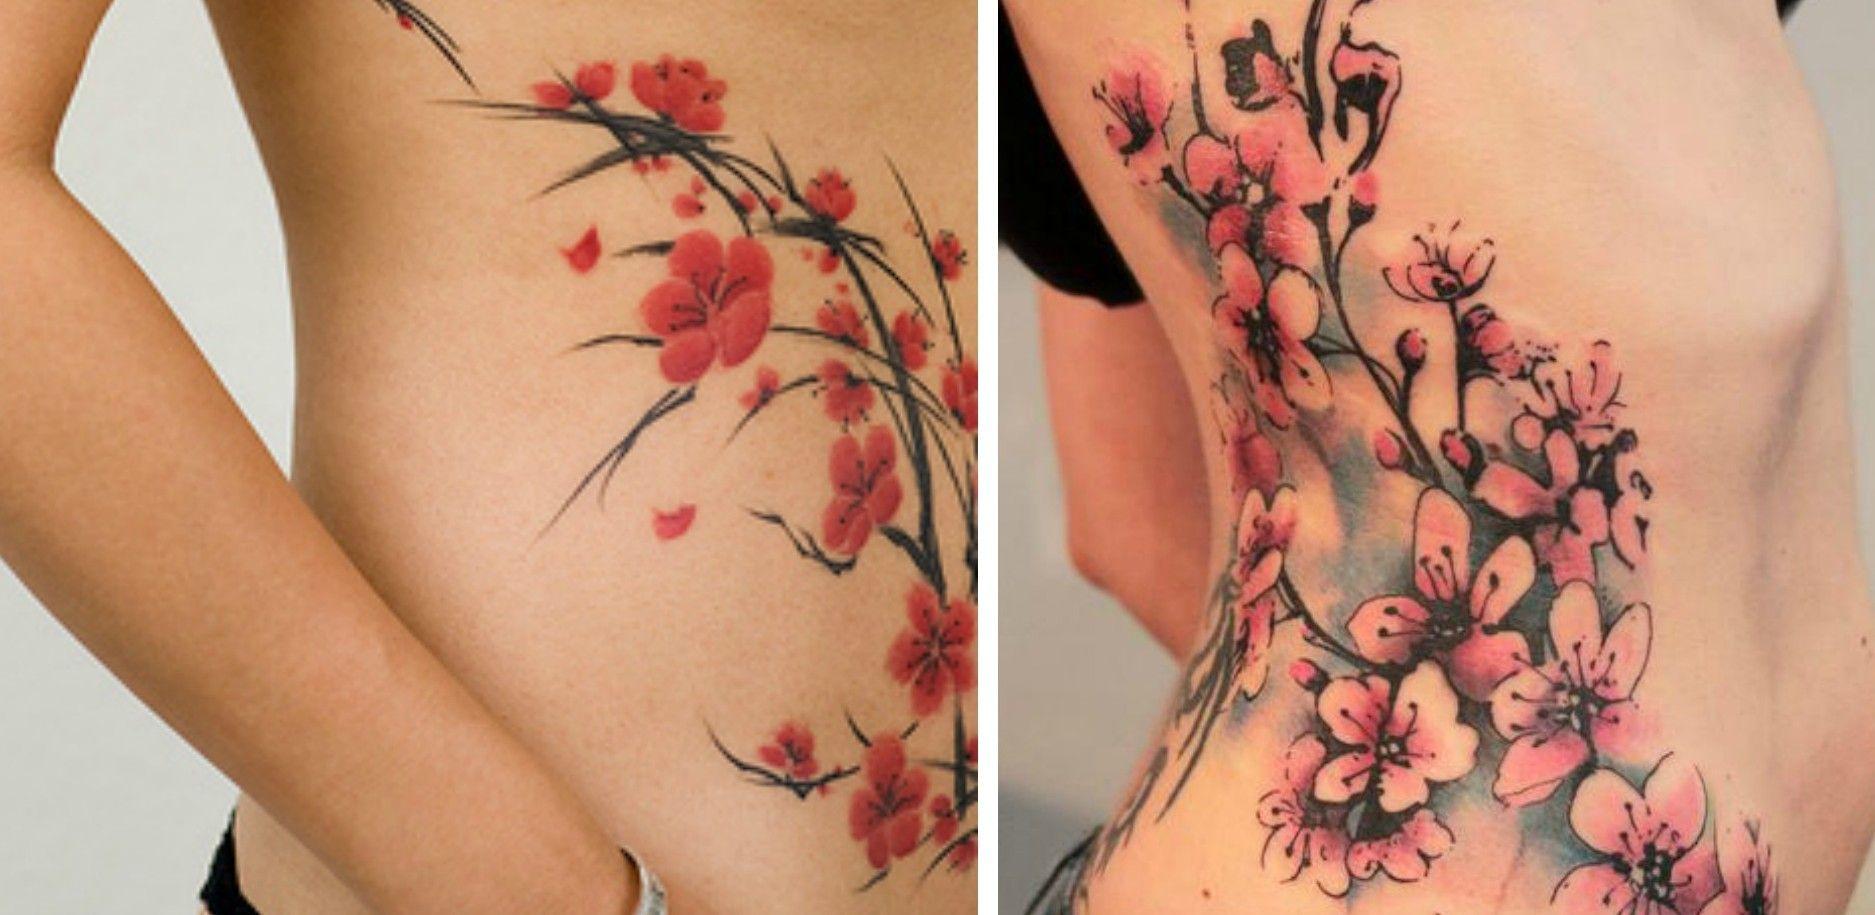 Tatouage Fleurs De Cerisier Tattoo Tatouage Tatouage Fleur Et